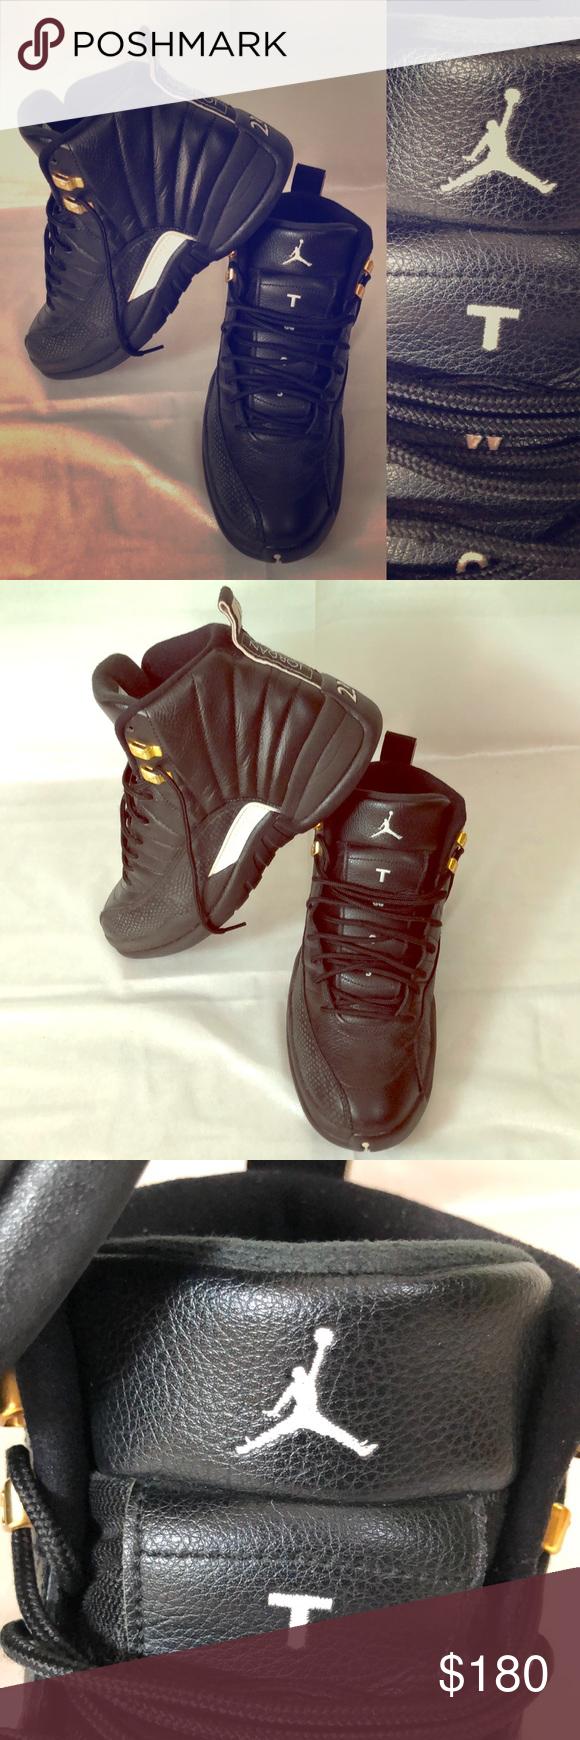 833c1858985 Air Jordan Retro 12 The Master size 9 Air Jordan Retro 12 The Master size 9